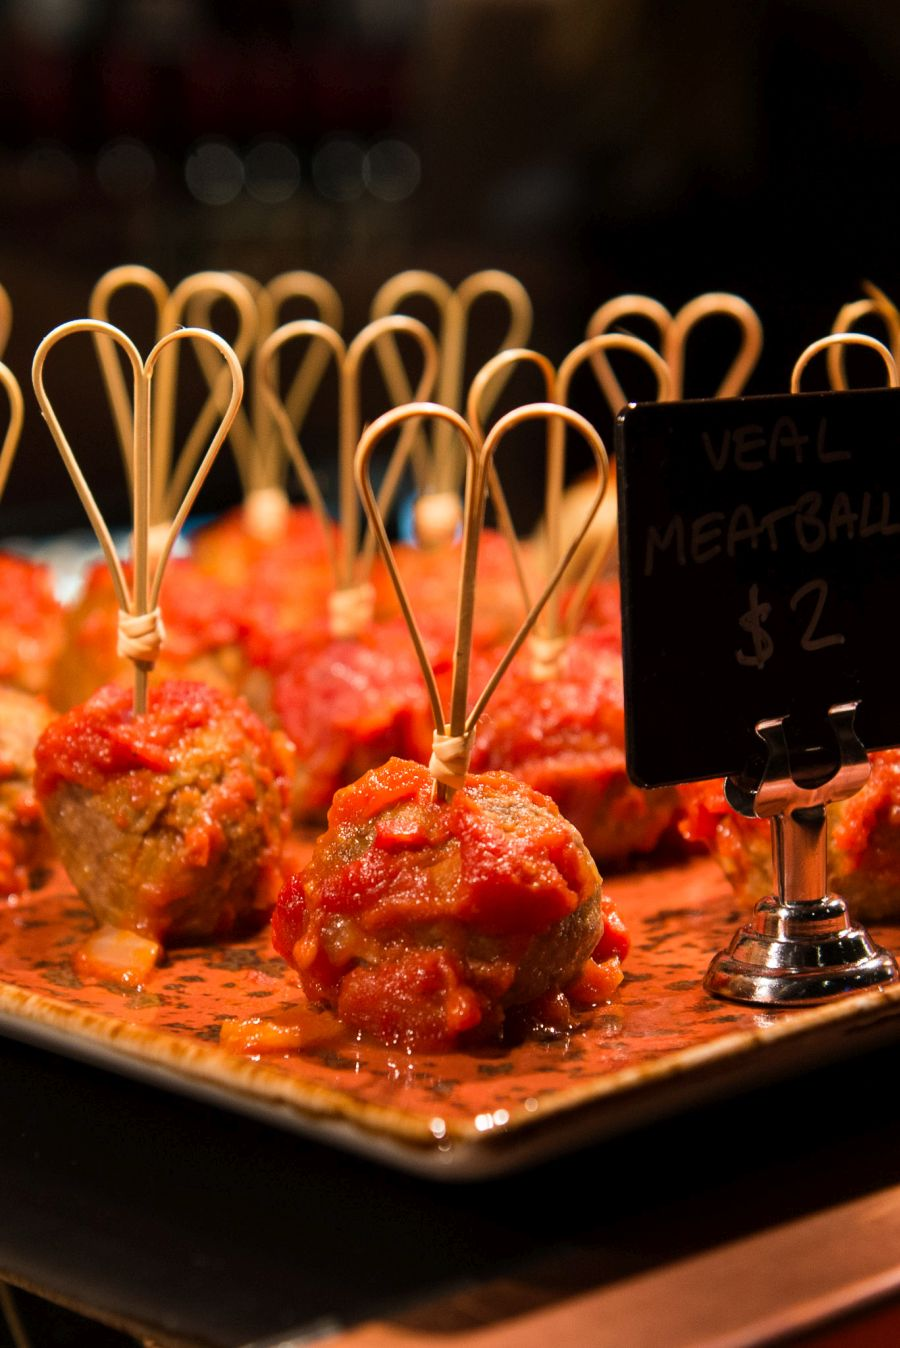 Veal meatballs (AU$2 each)